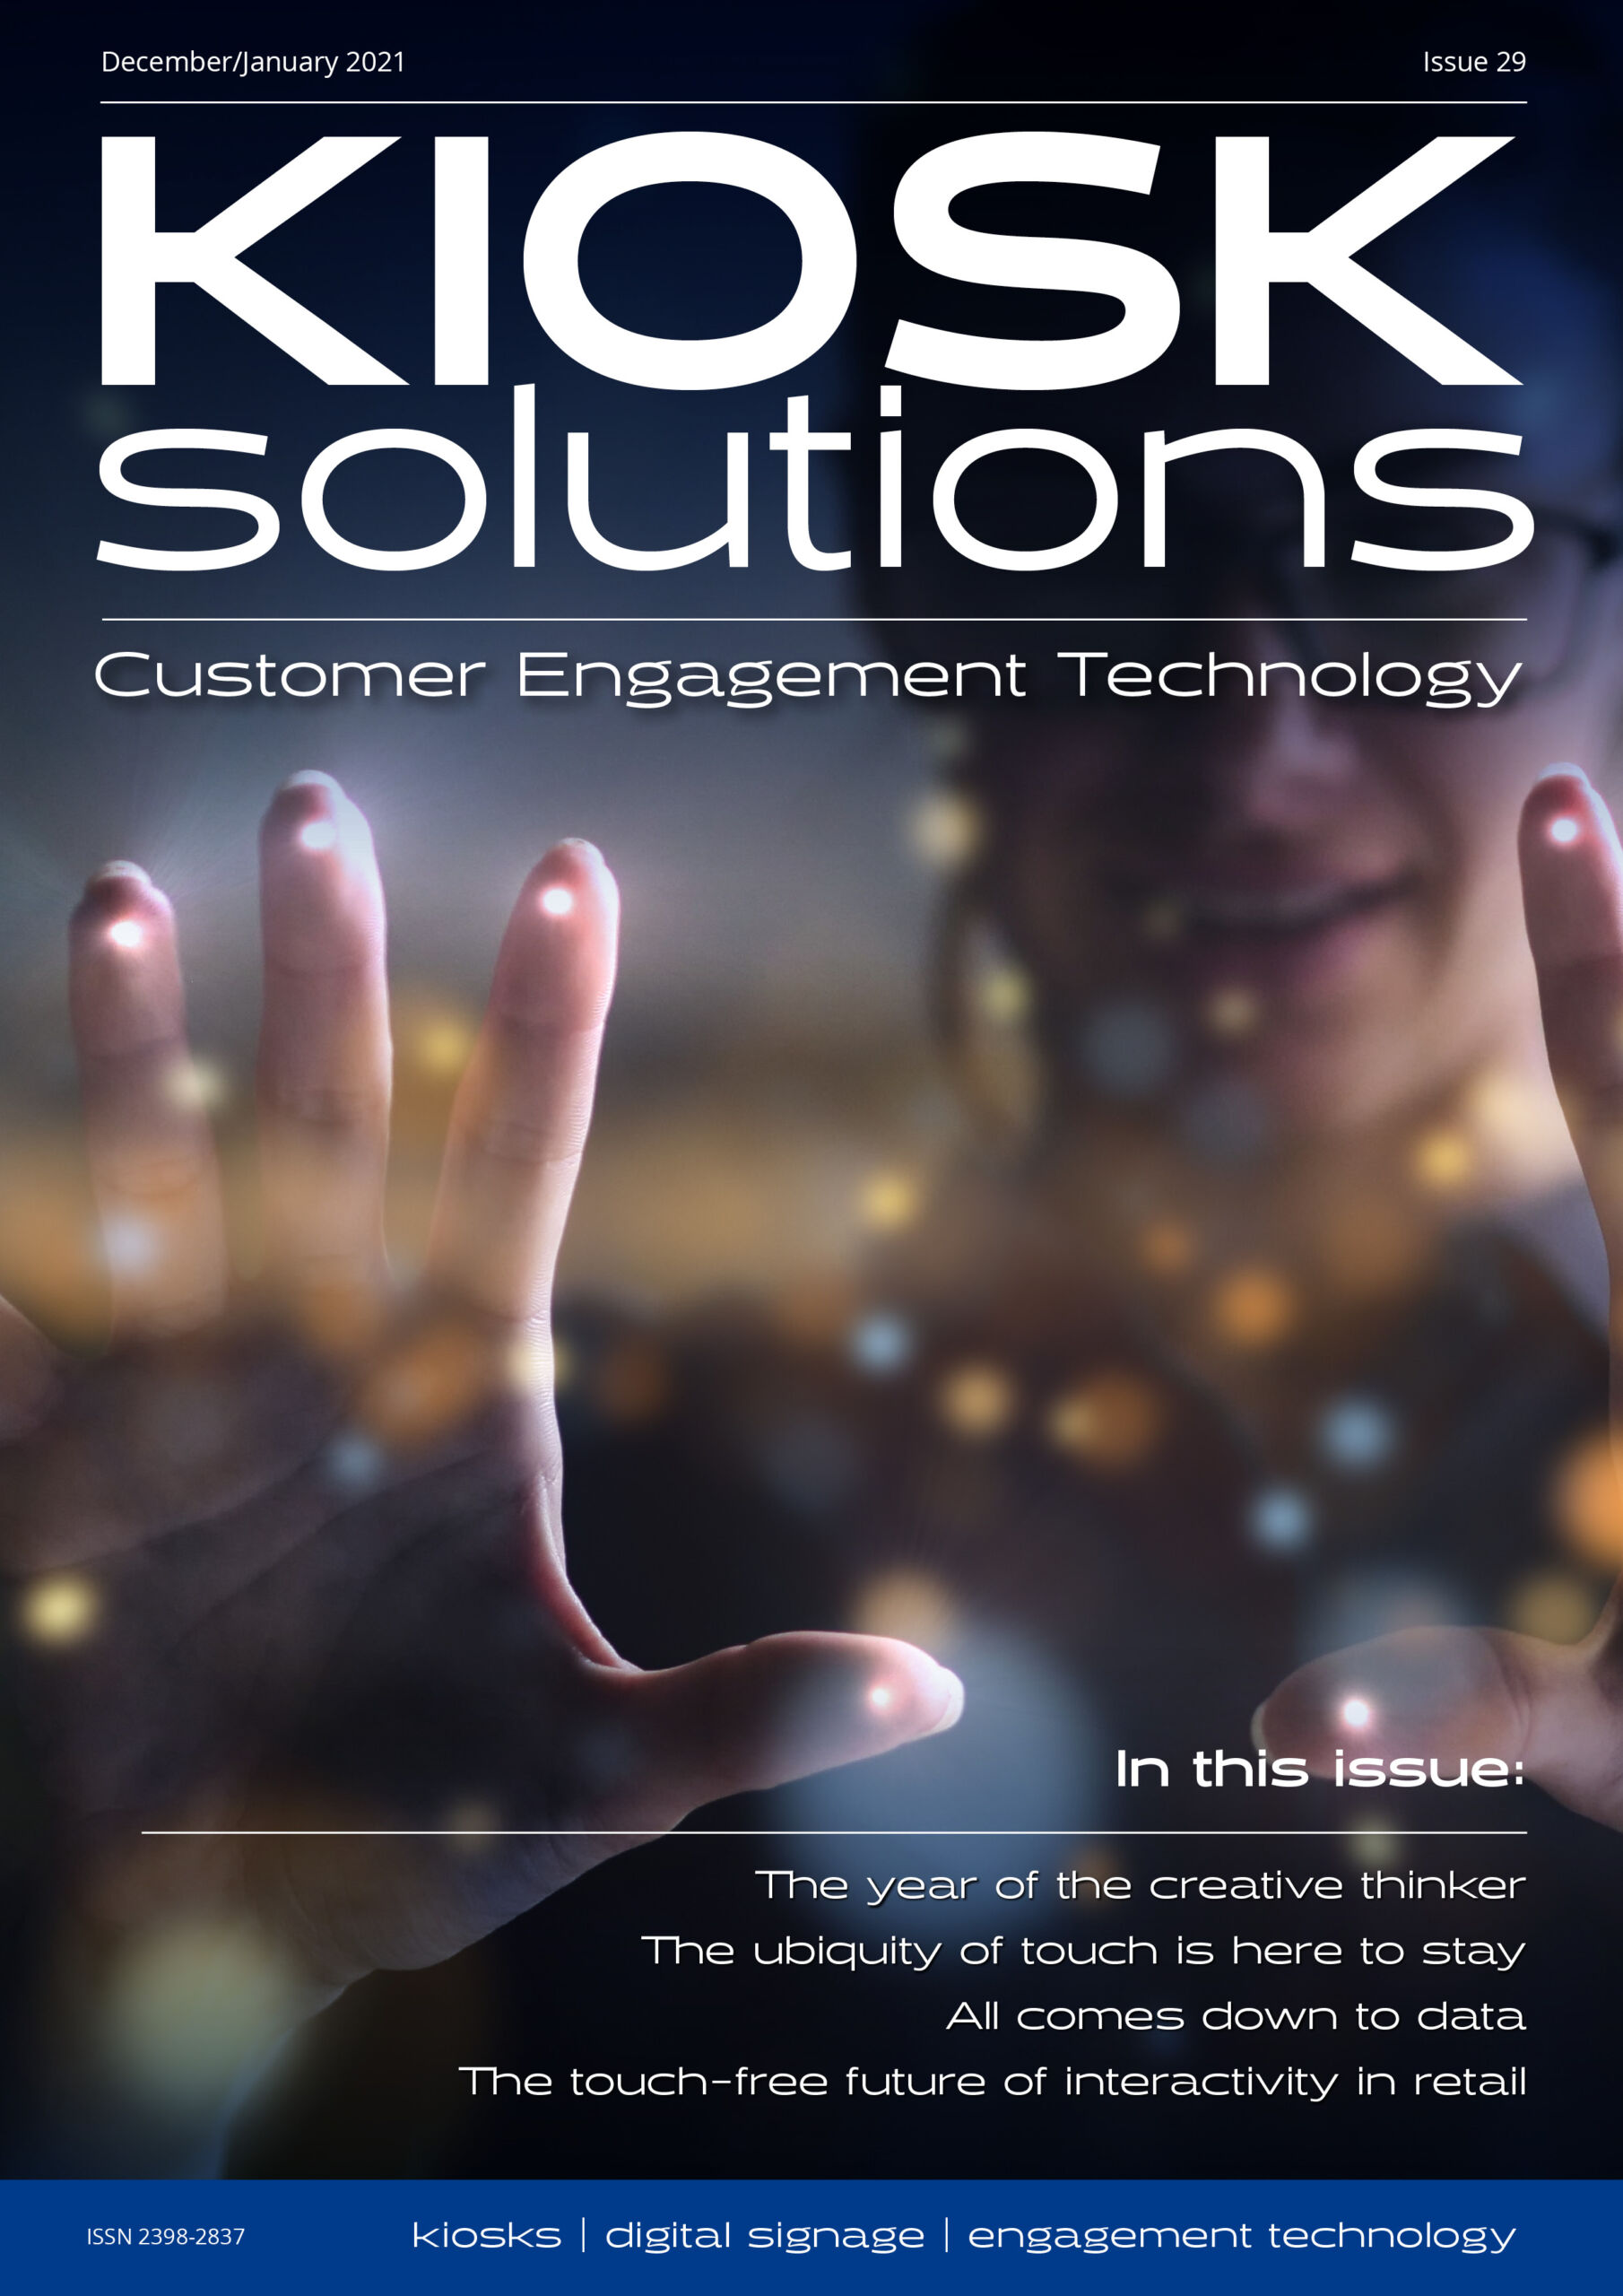 Kiosk Solutions Magazine - Dec-Jan 21 Issue